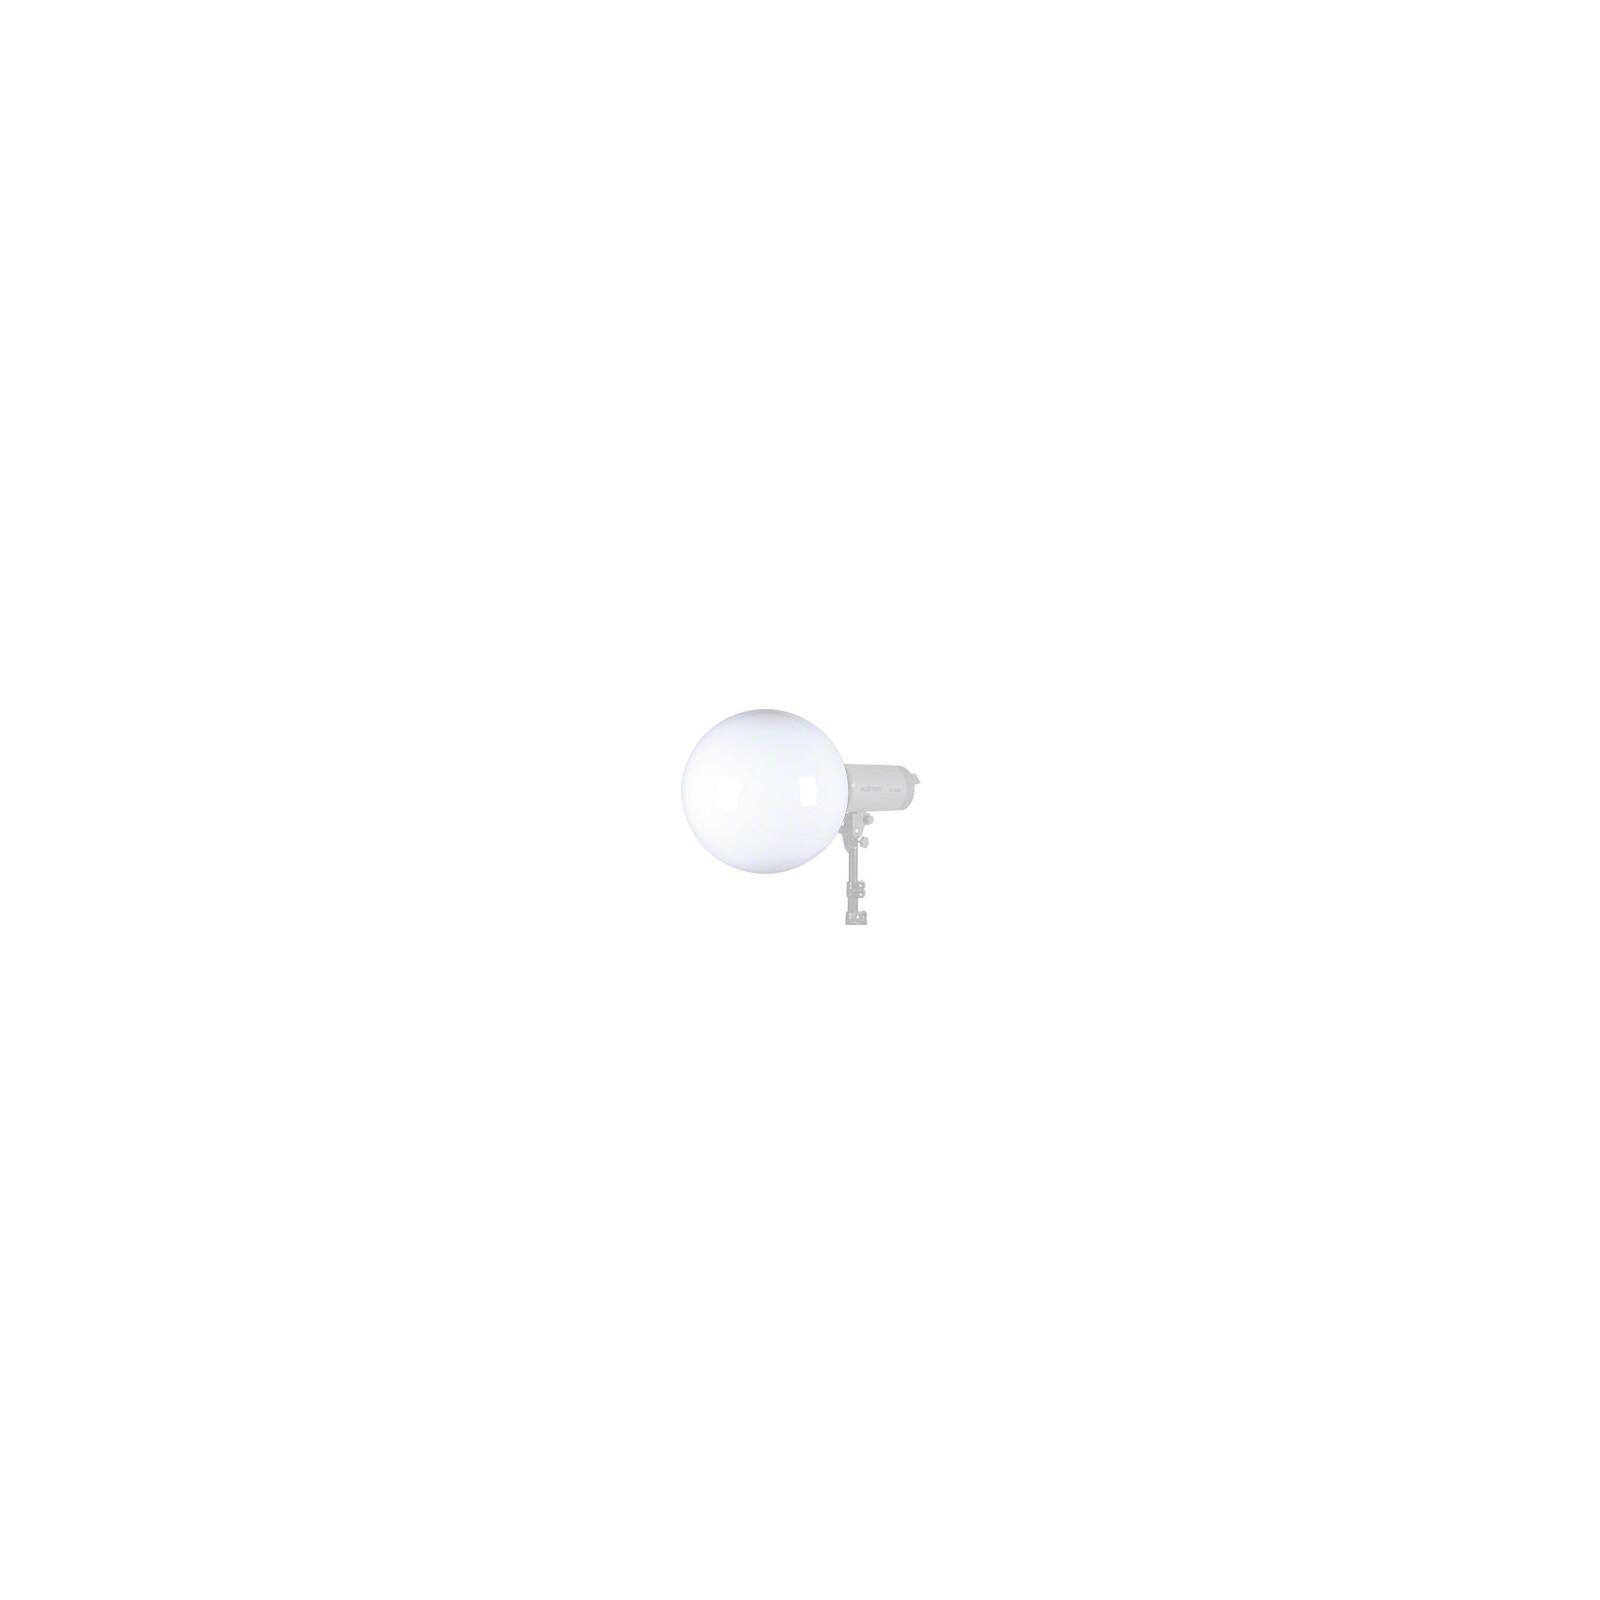 walimex Universal Diffusorkugel, 30cm C&CR Serie